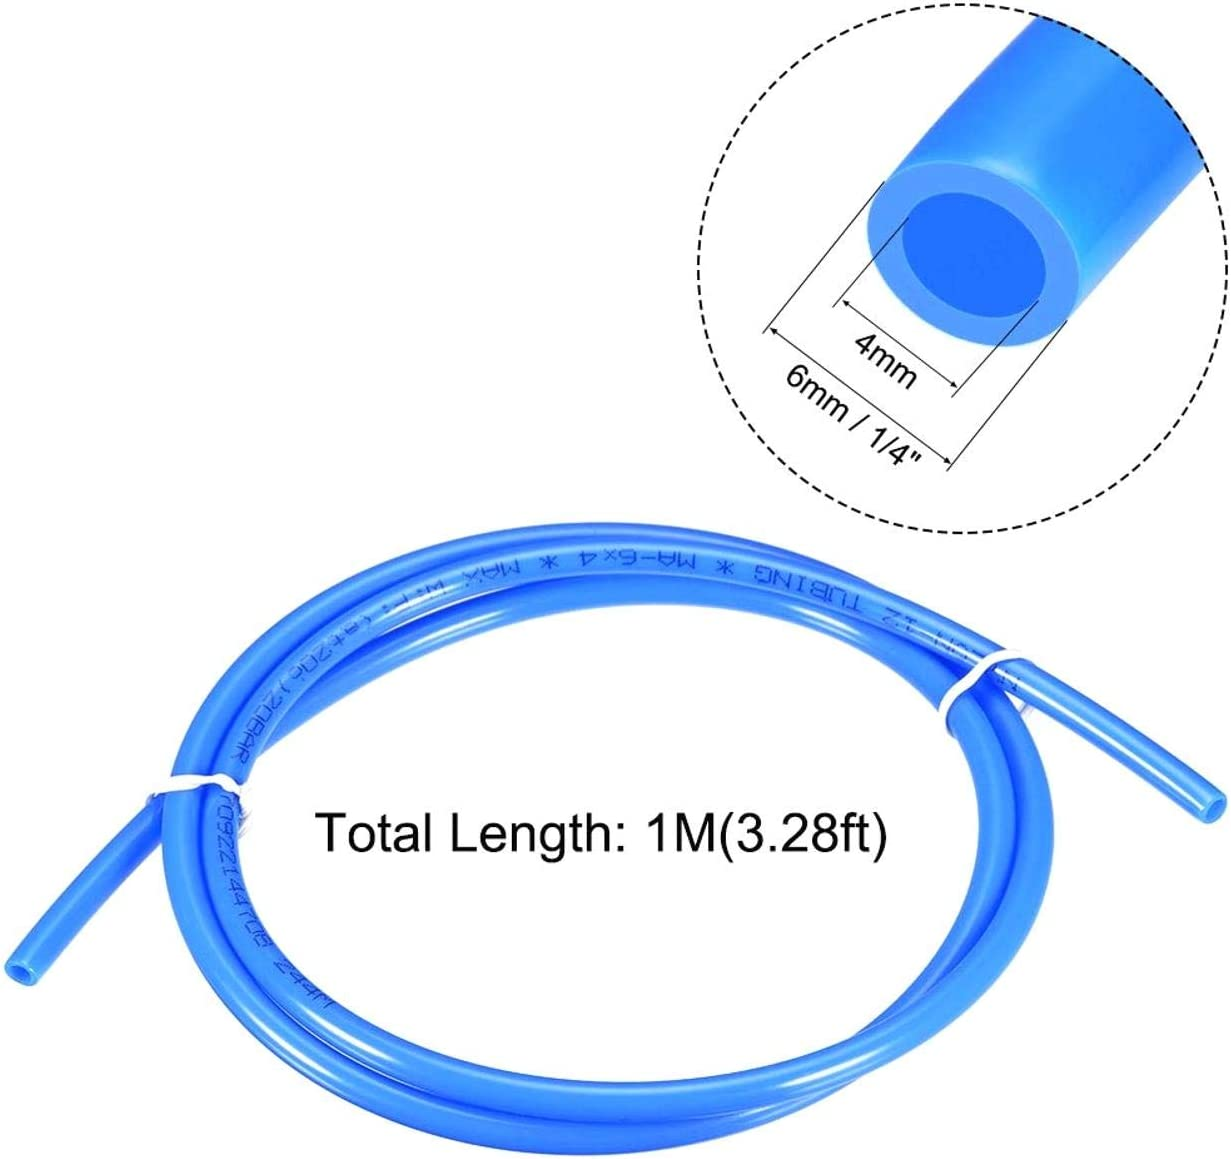 TINGB Tubo Pneumatico in Poliuretano PU Tubo Flessibile per Sistema frenante ad Aria o trasferimento Fluido 1M Blacl 4mm OD x 2,5mm ID